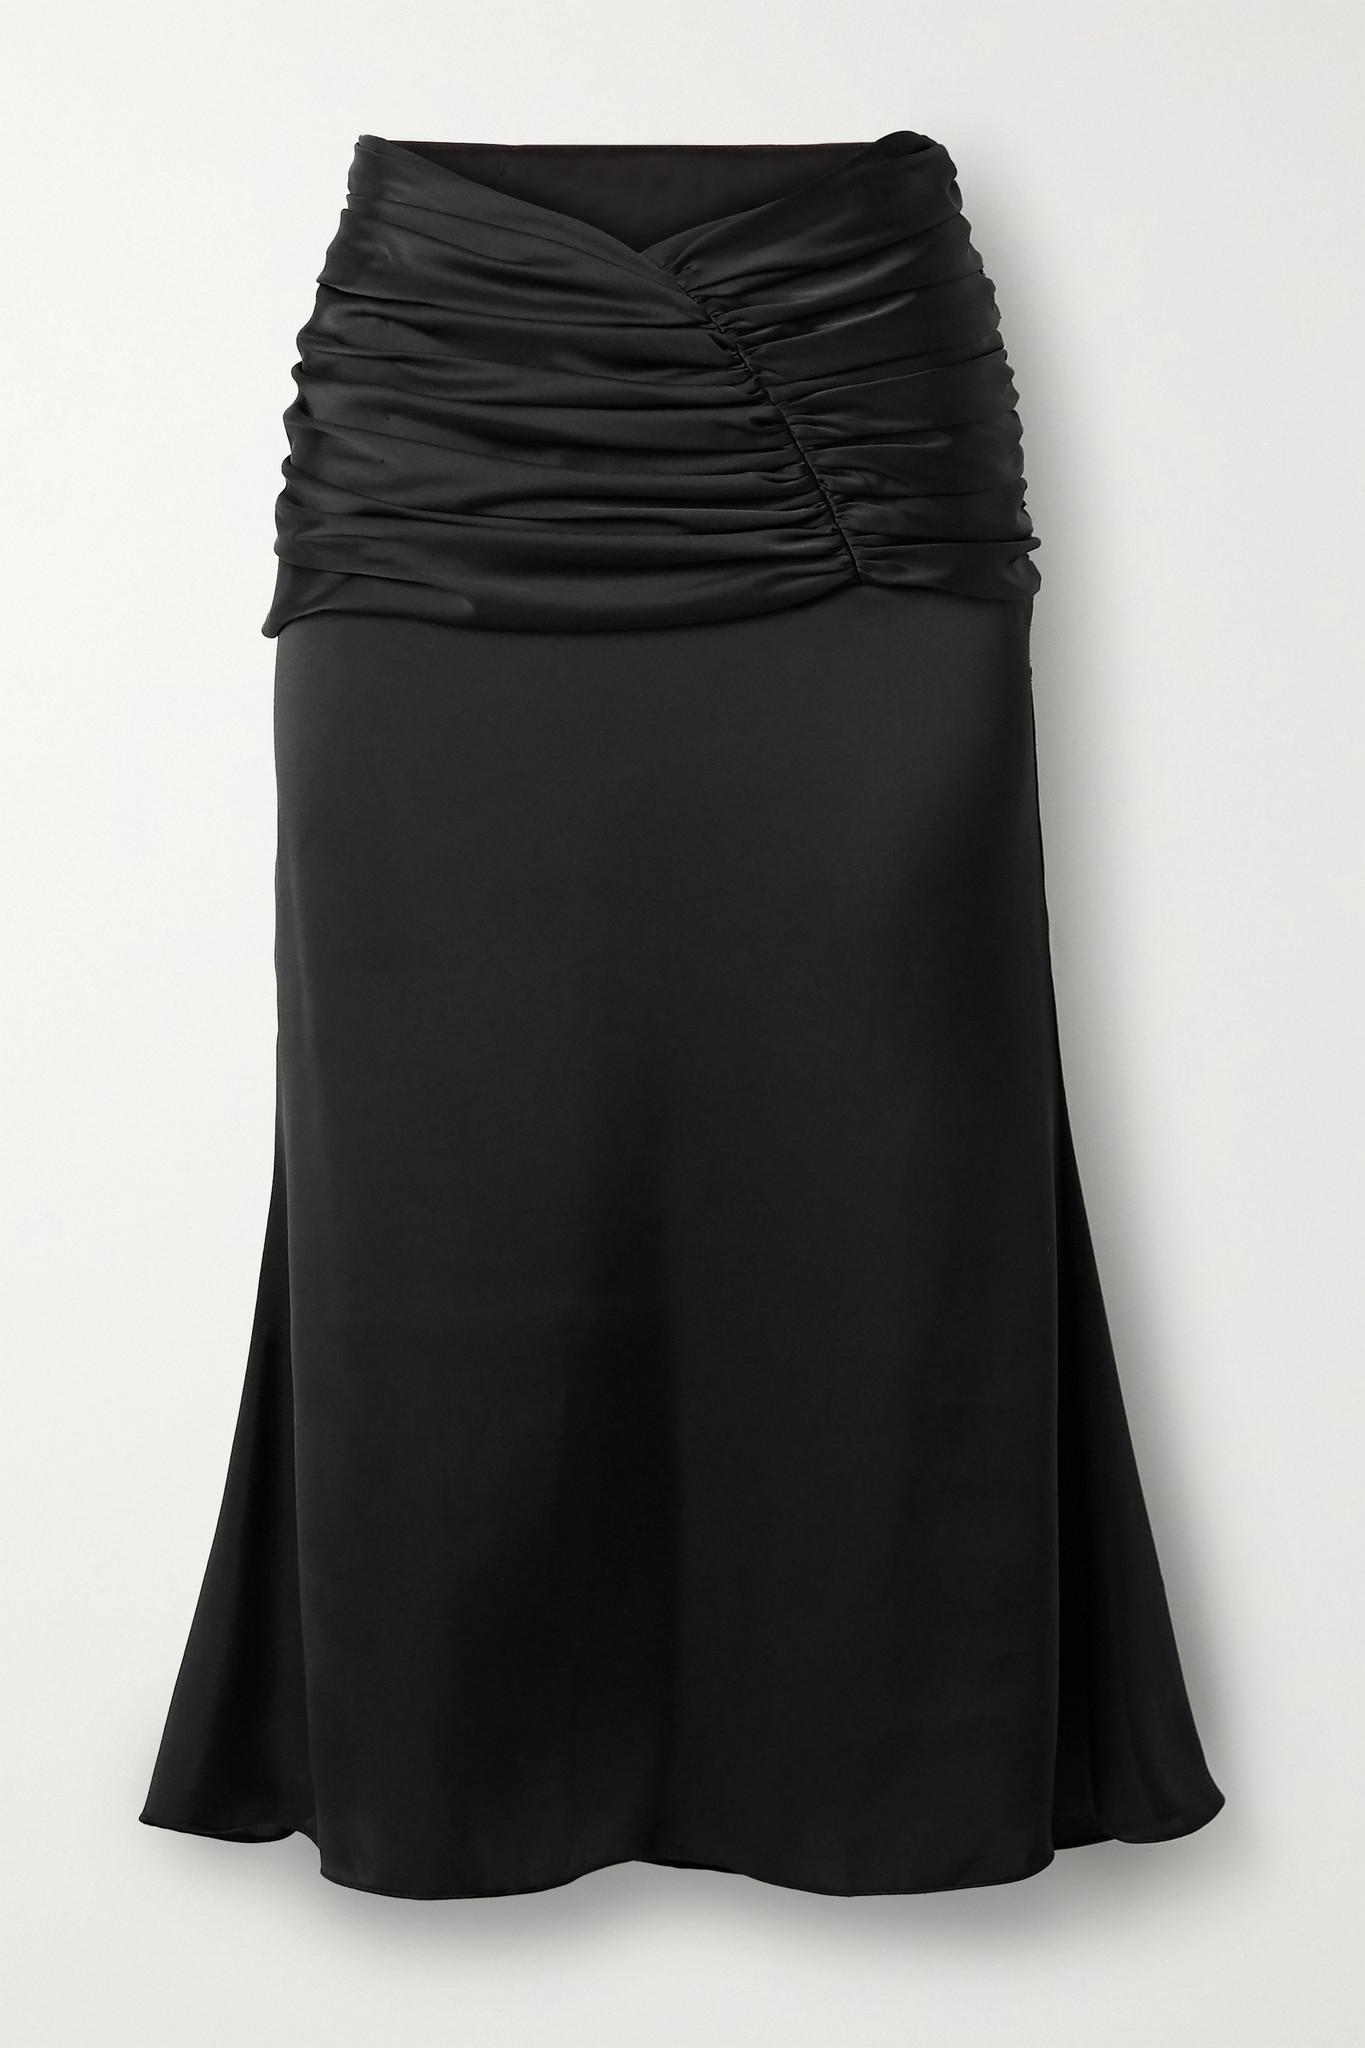 ORSEUND IRIS - Romantique Ruched Satin Skirt - Black - x small